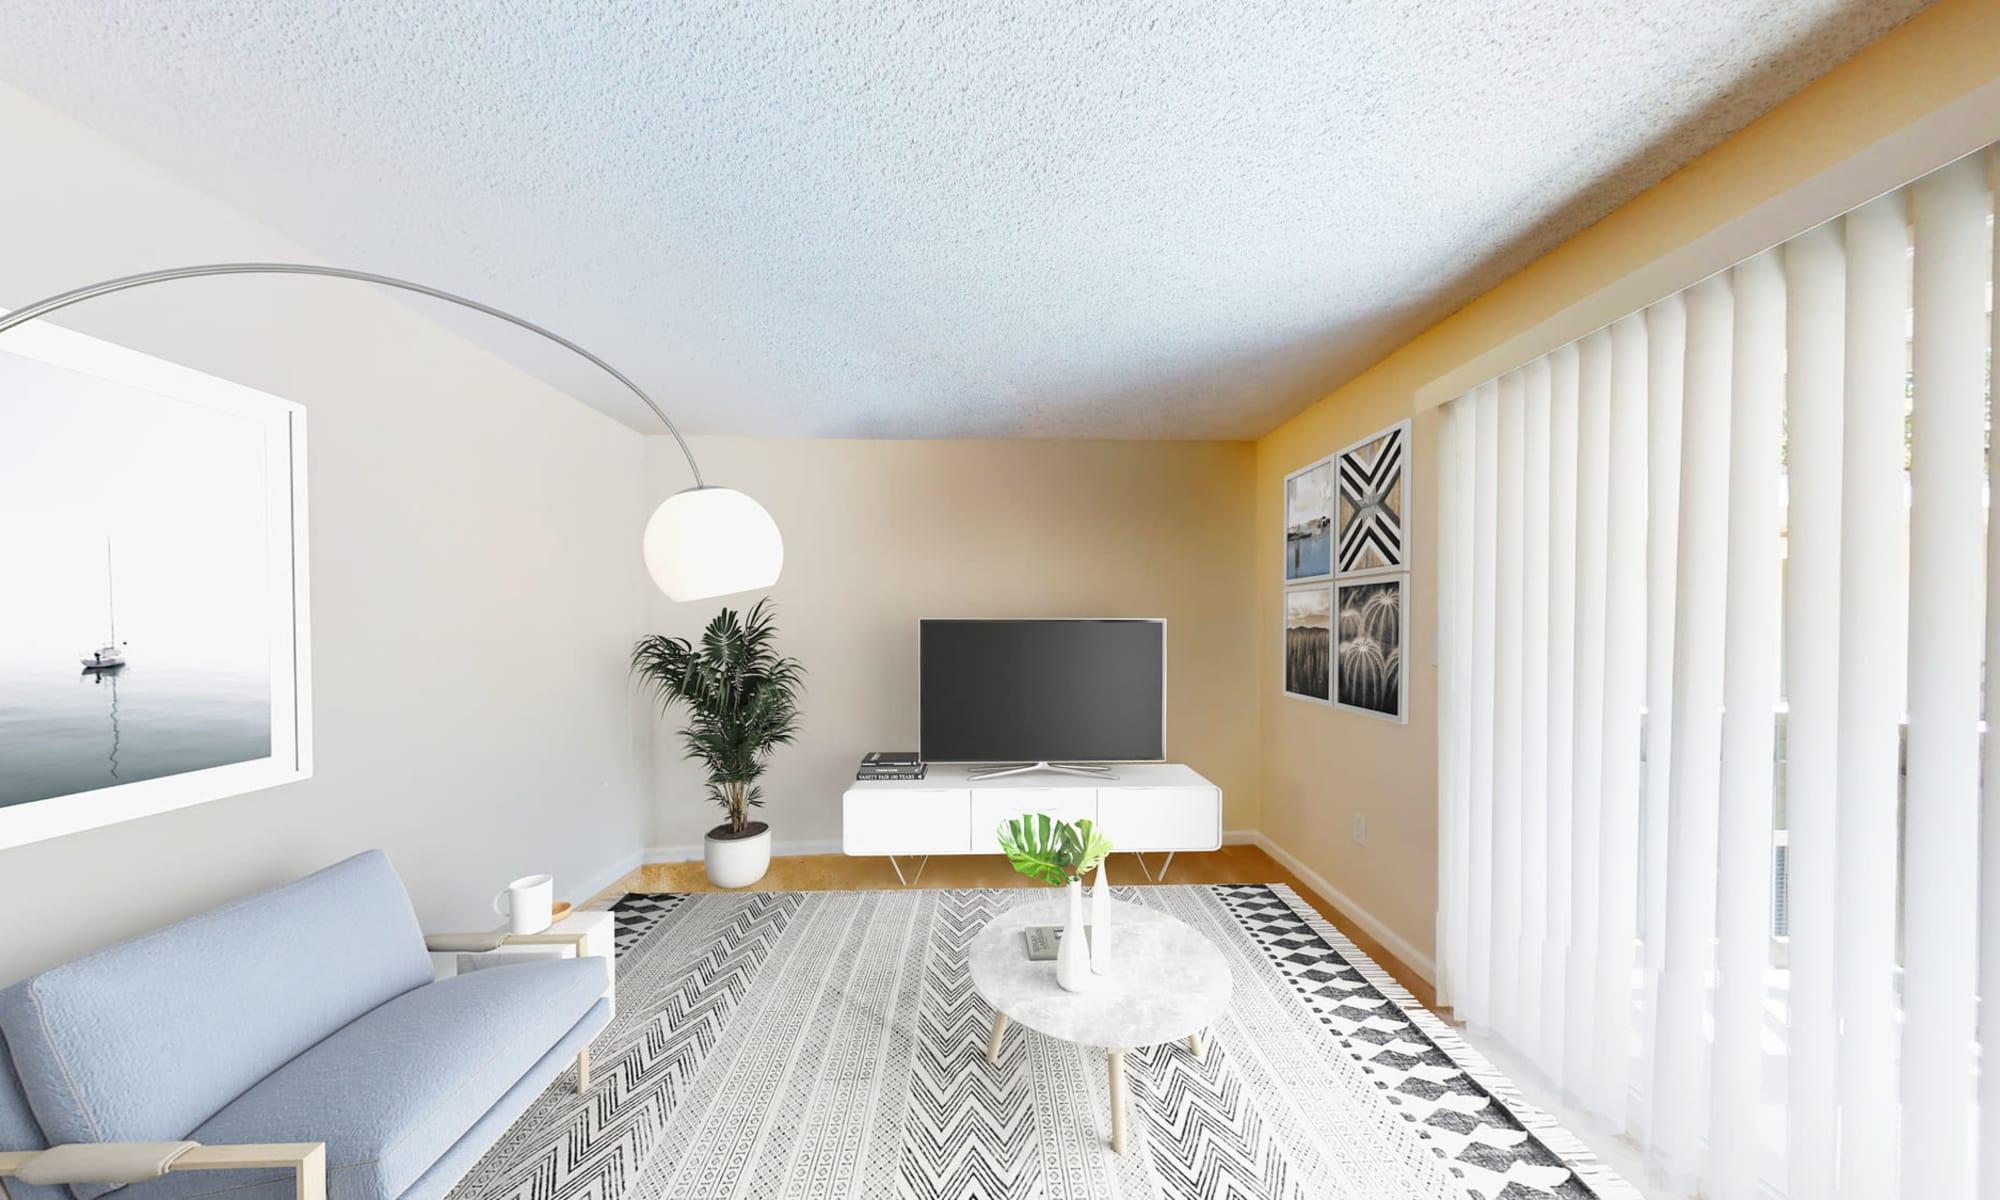 Model apartment's living area with comfortable furnishings at Pleasanton Glen Apartment Homes in Pleasanton, California